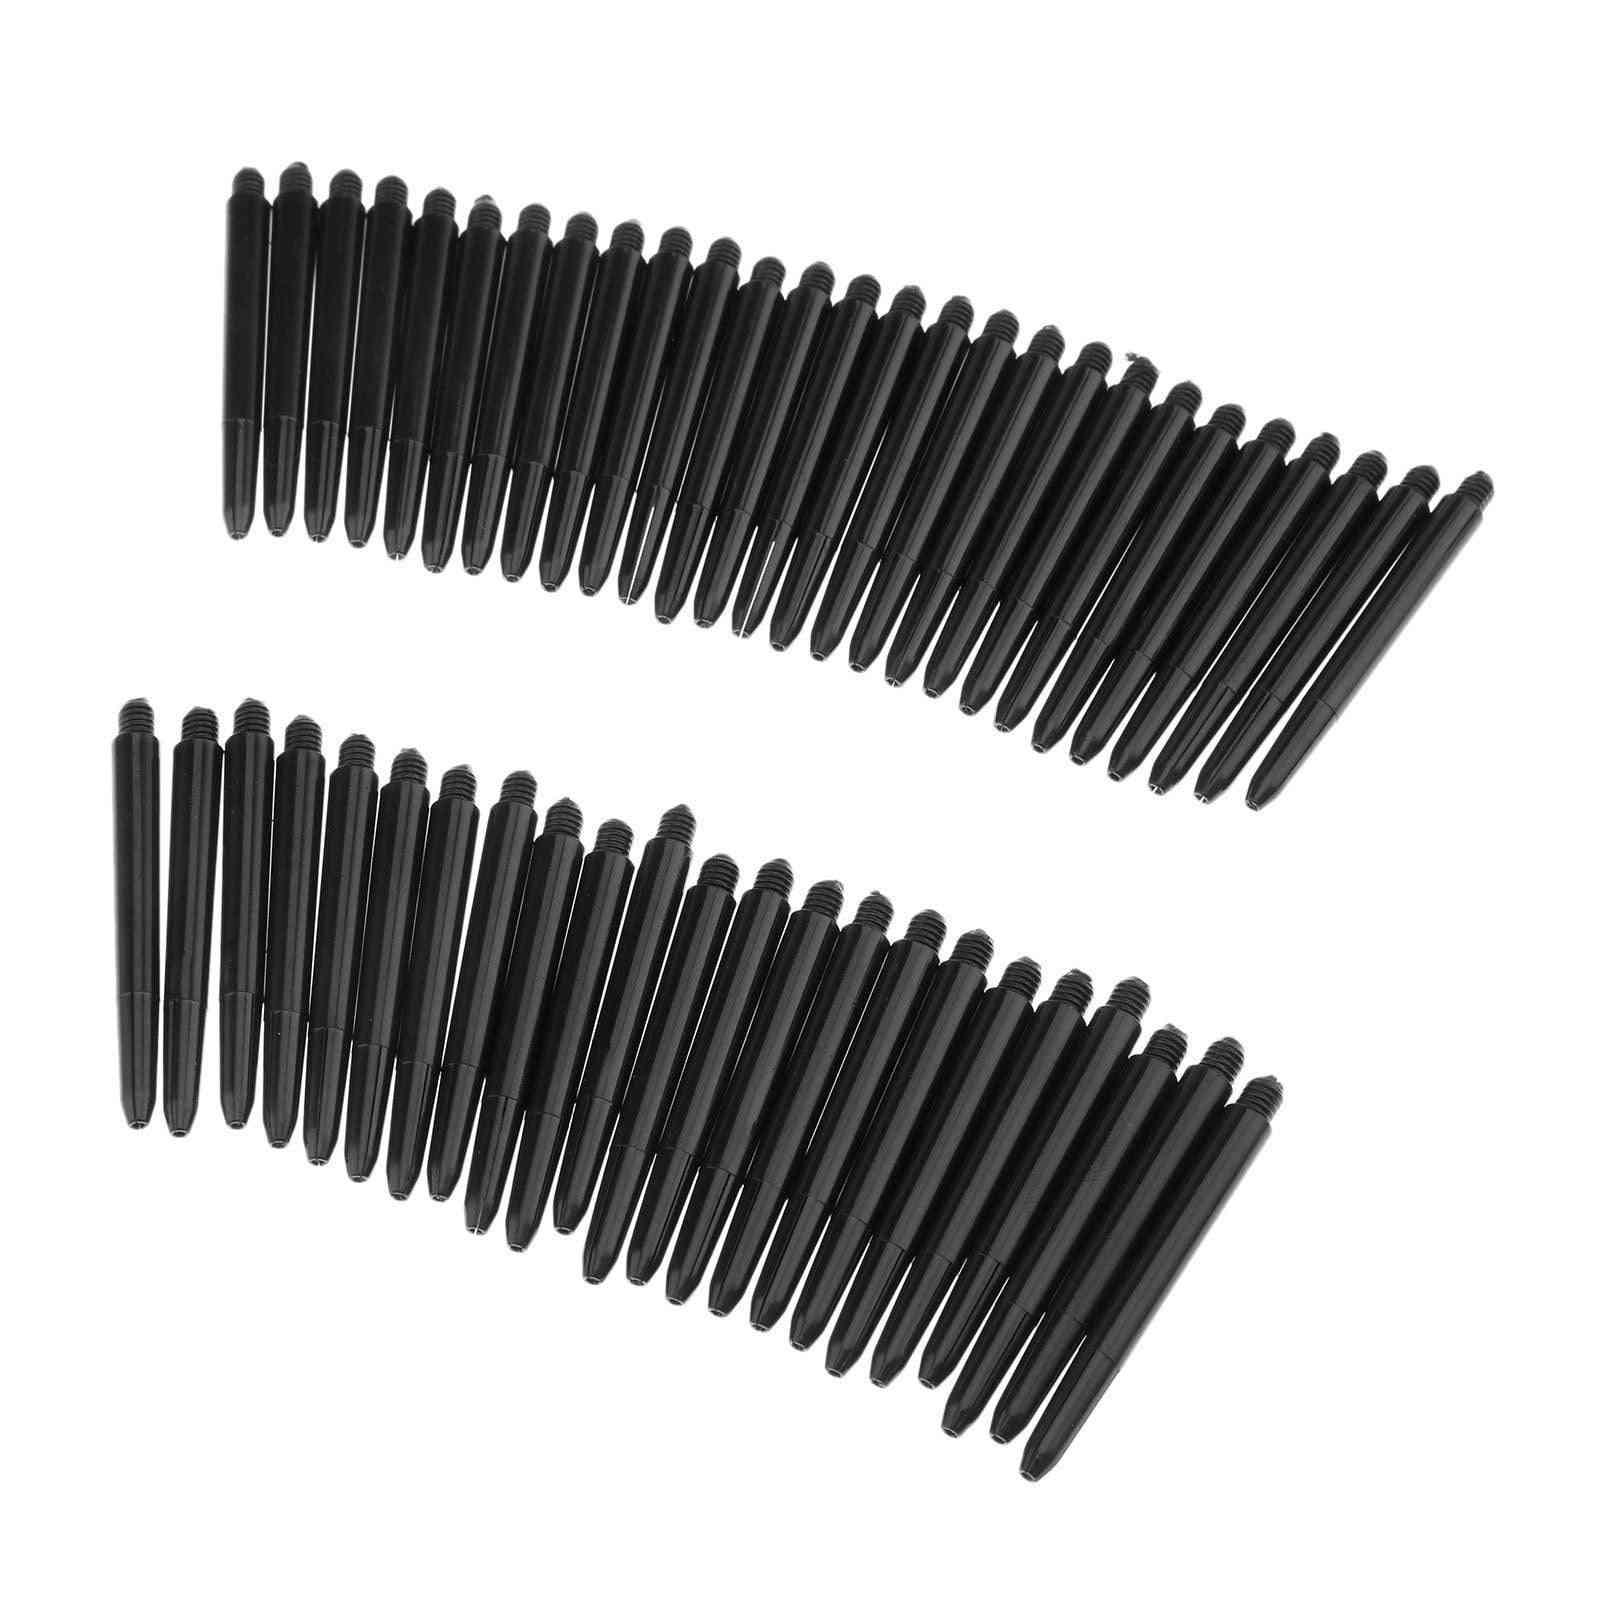 Black Nylon Dart Shafts Screw Thread, Plastic Rod Stems, Darts Accessories